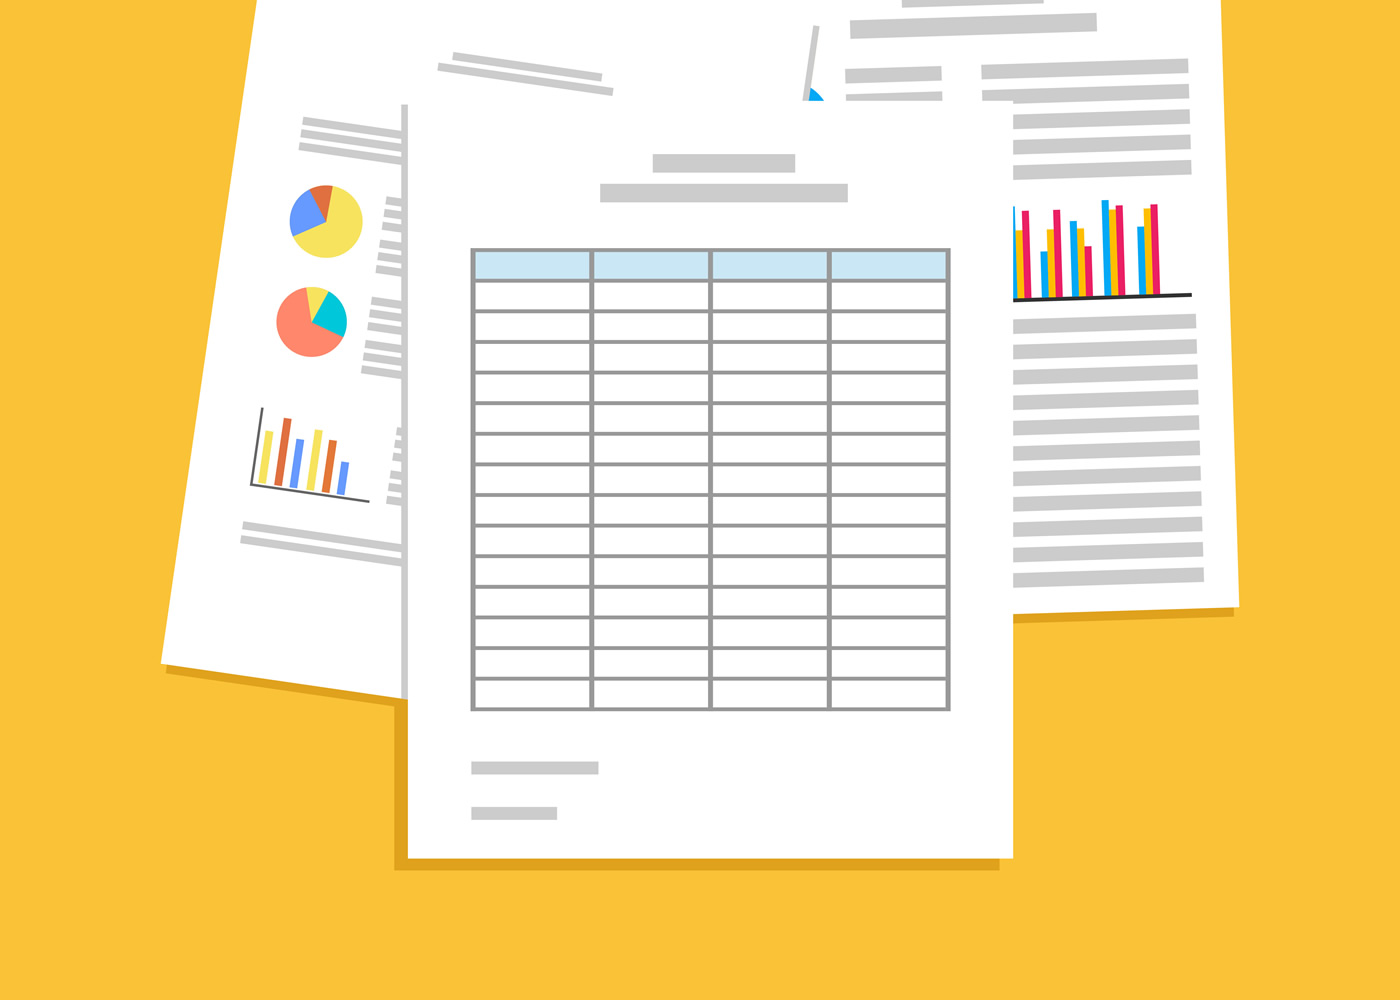 naem-research-quickpolls-2016-01-regulatory-non-compliance-measurement-700x500